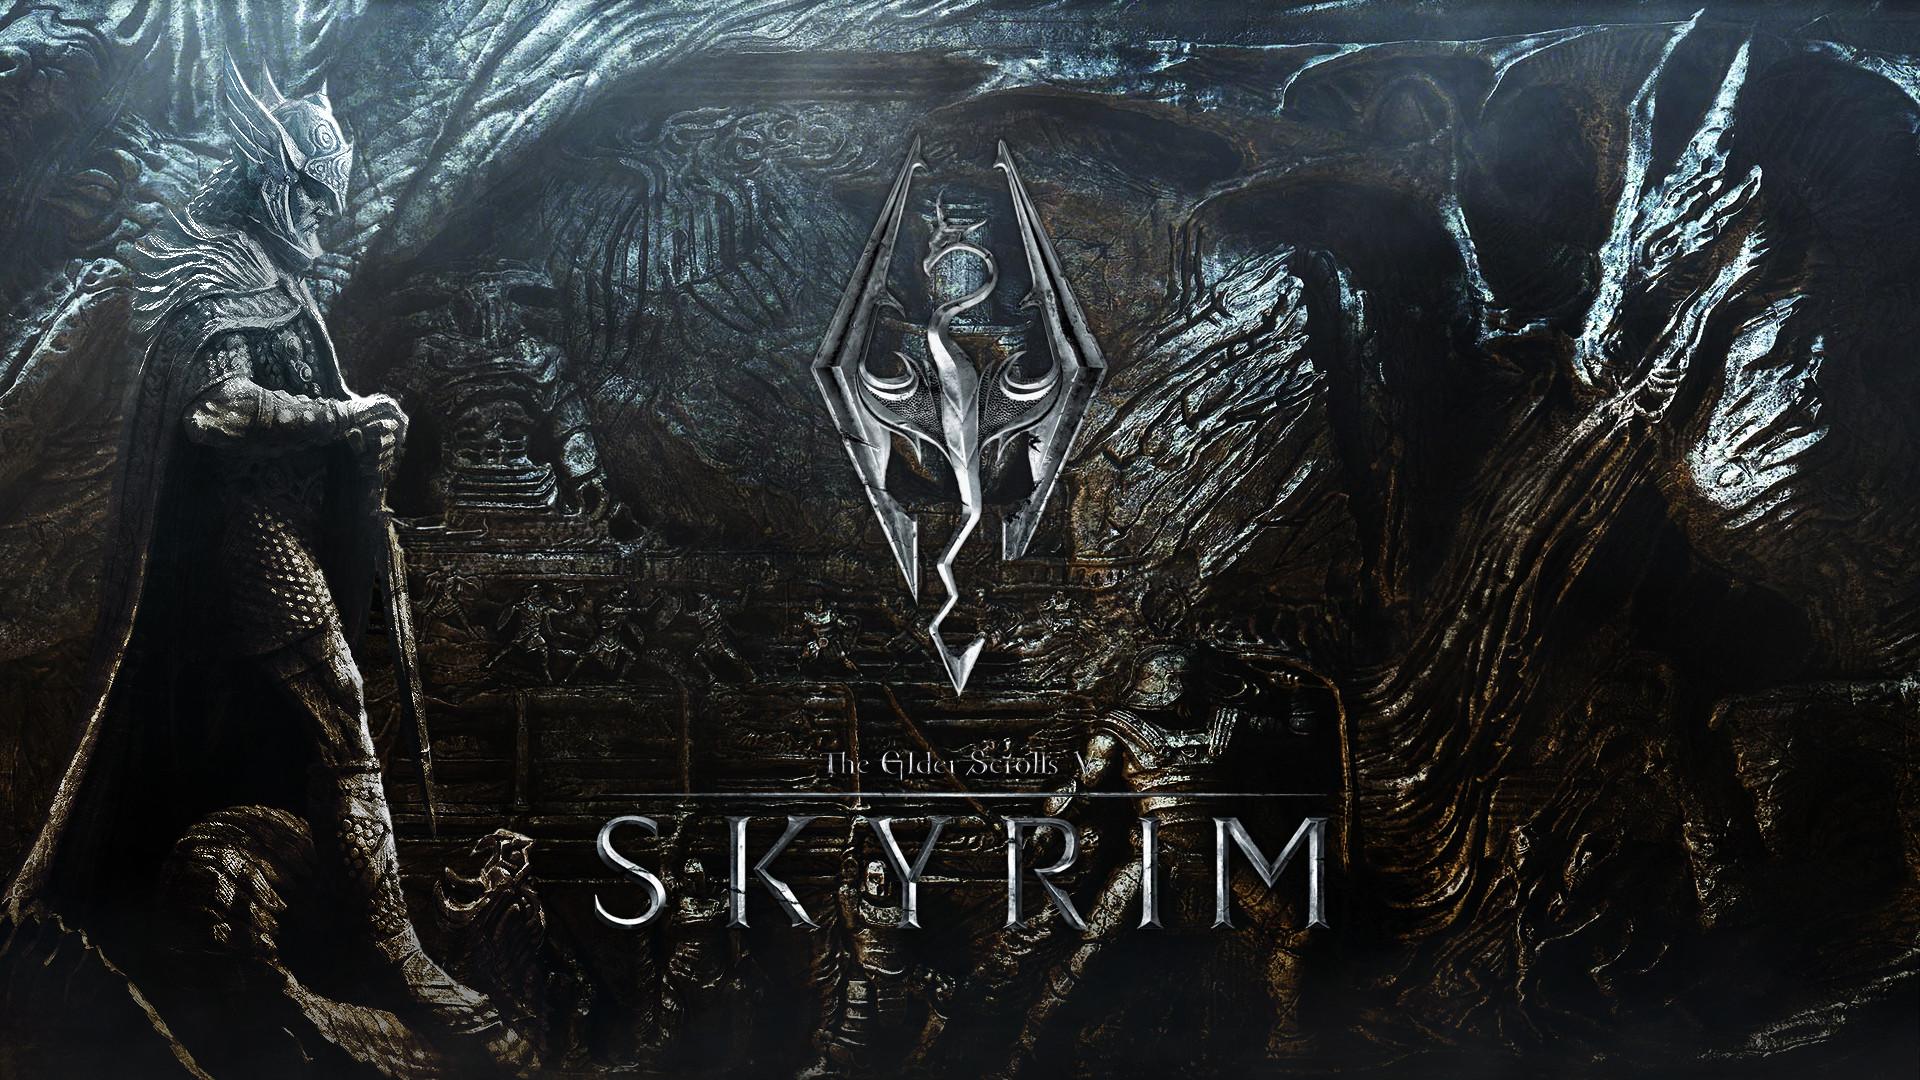 download skyrim full 1920x1080 - photo #23